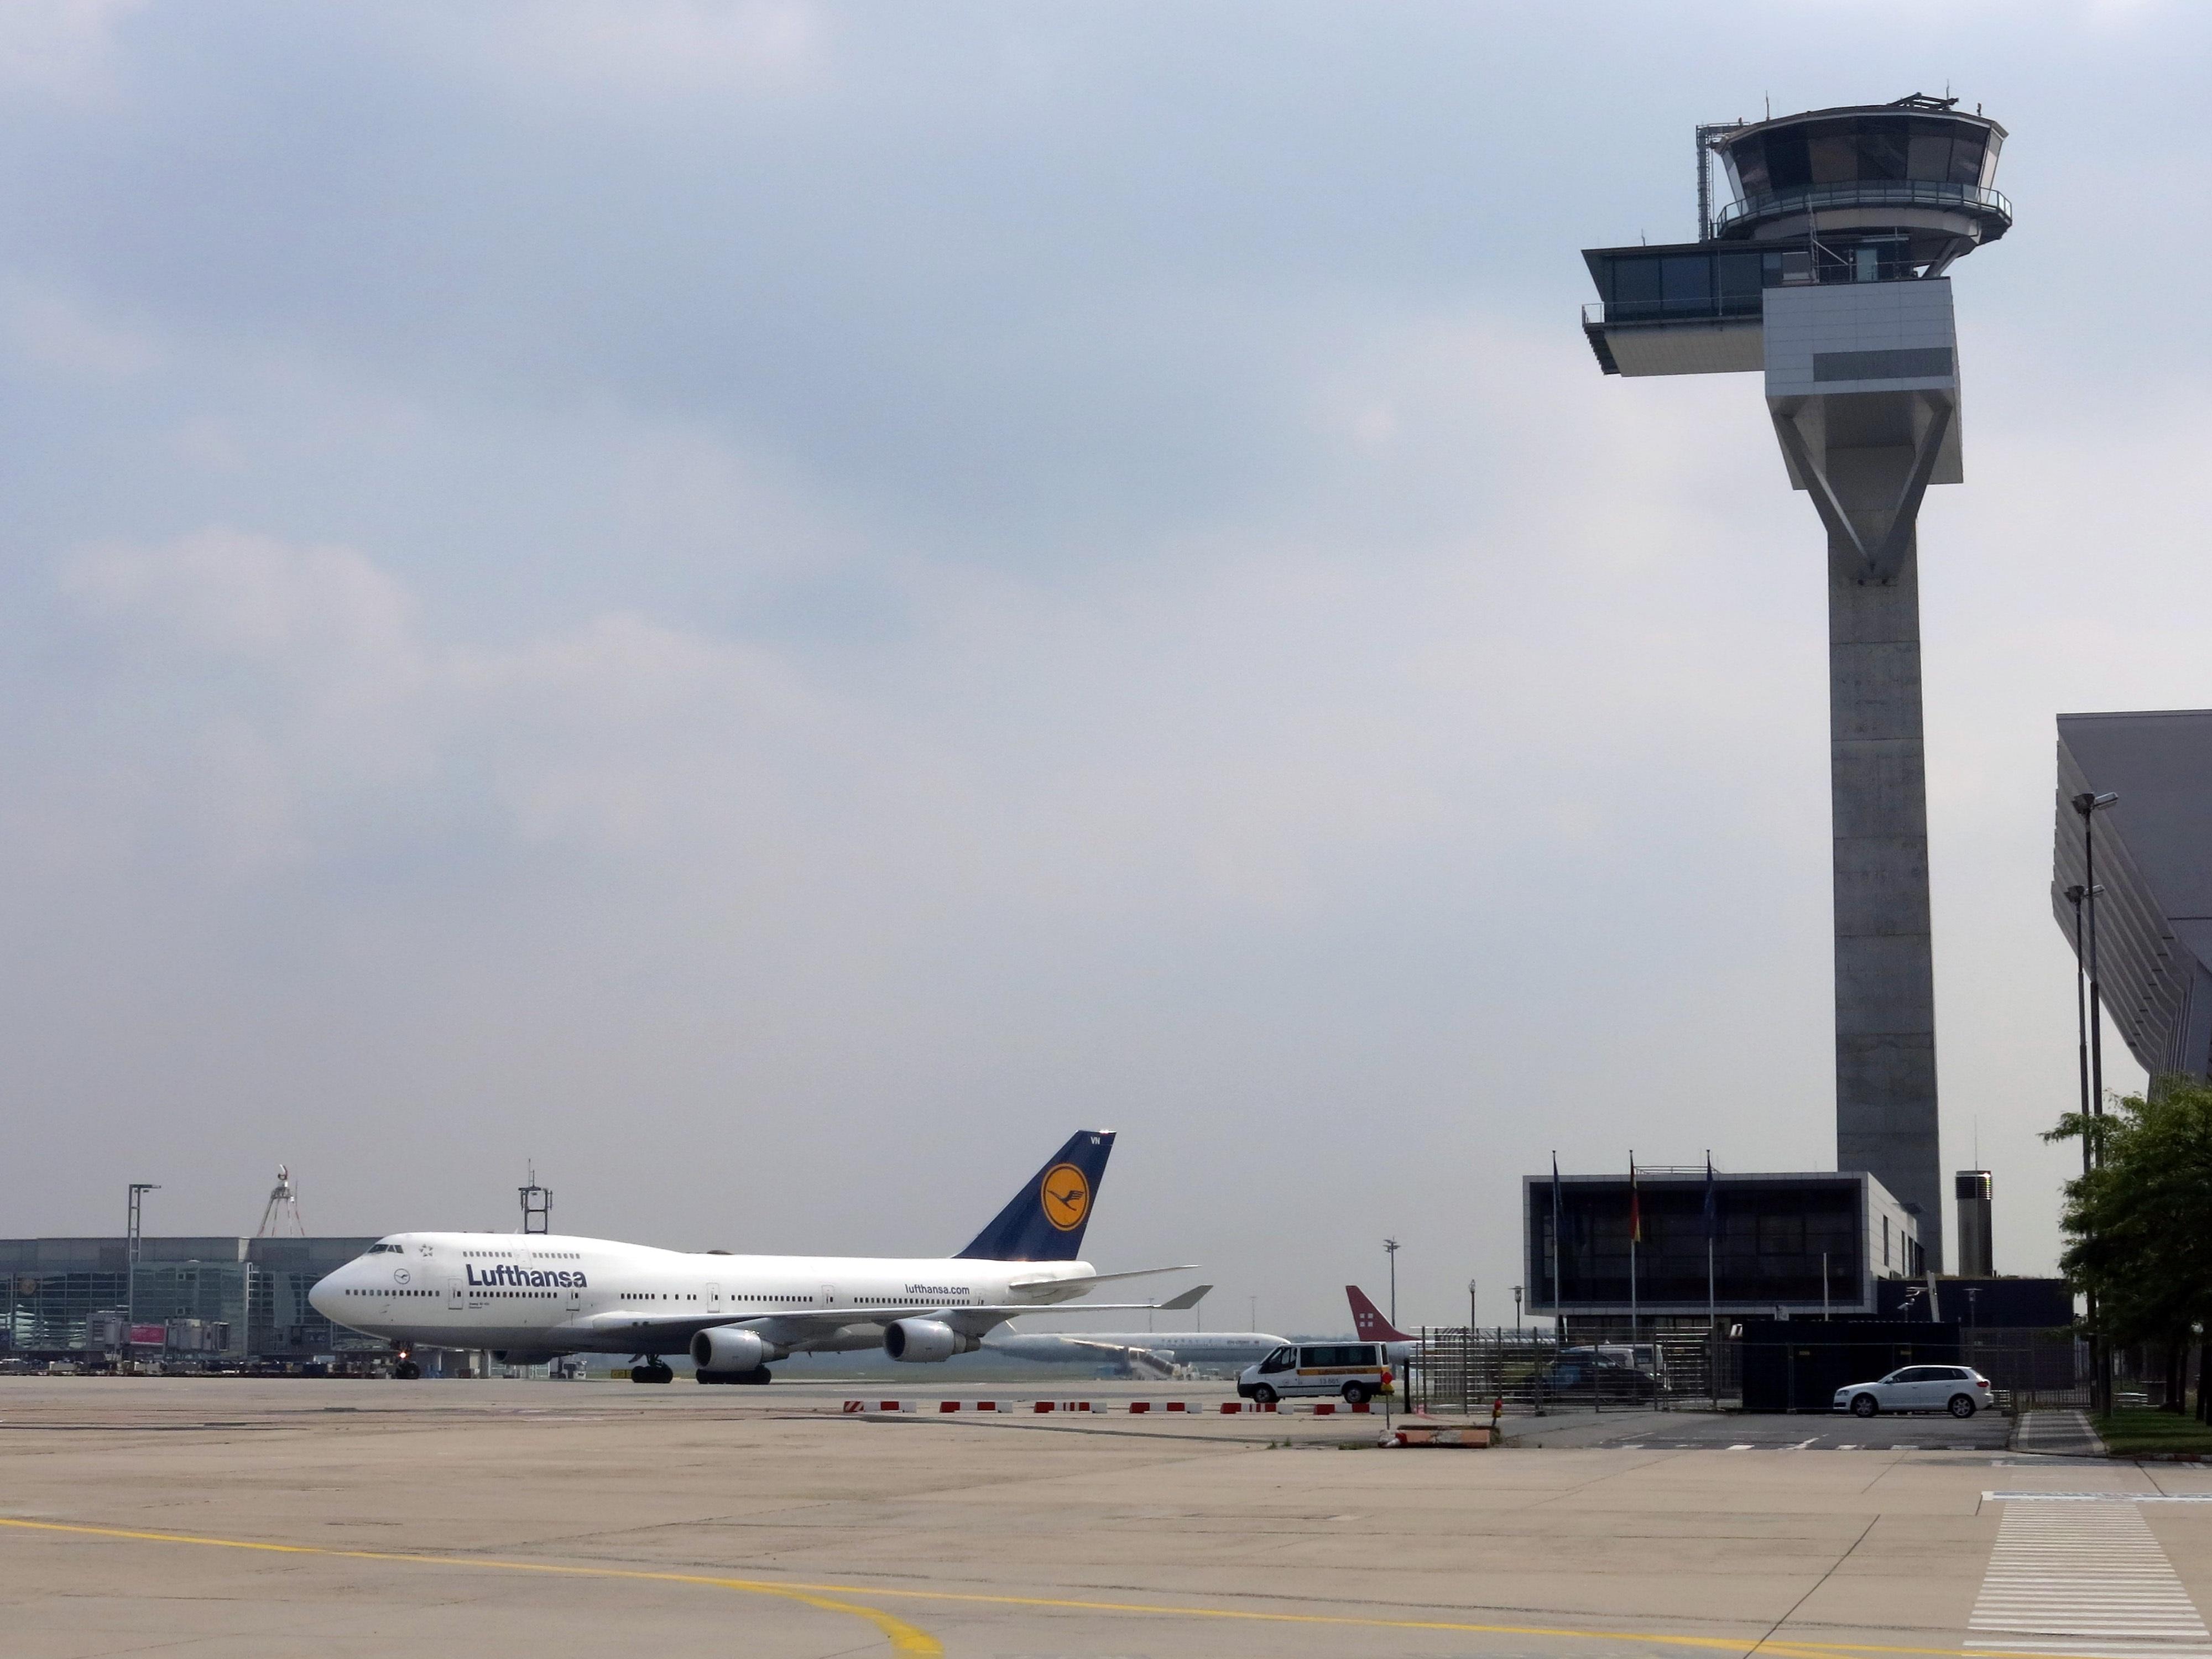 Gambar Bangunan Bandara Pesawat Terbang Kendaraan Perusahaan